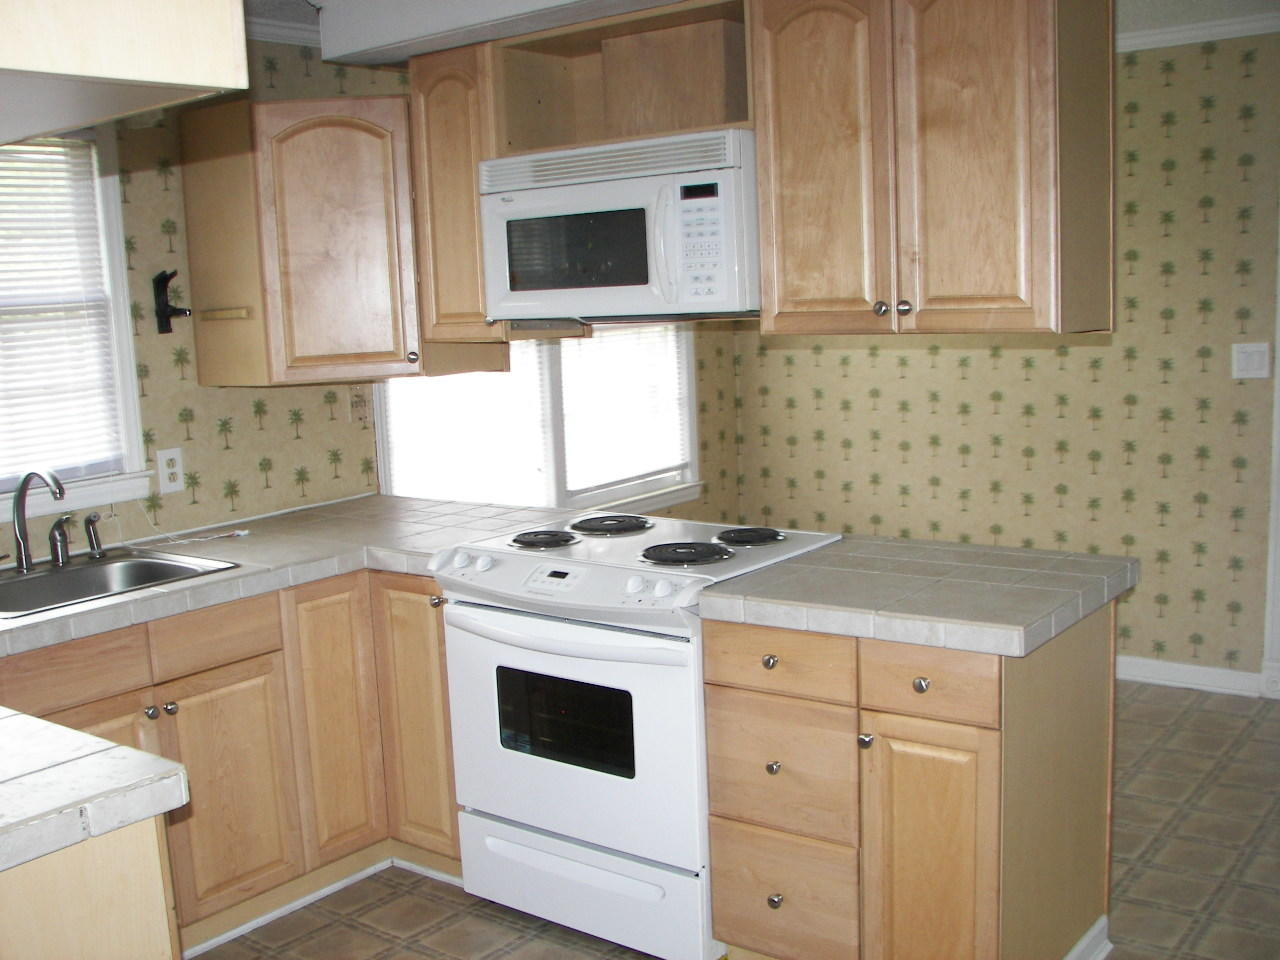 Glendale Acres Homes For Sale - 214 Ruby, Summerville, SC - 2